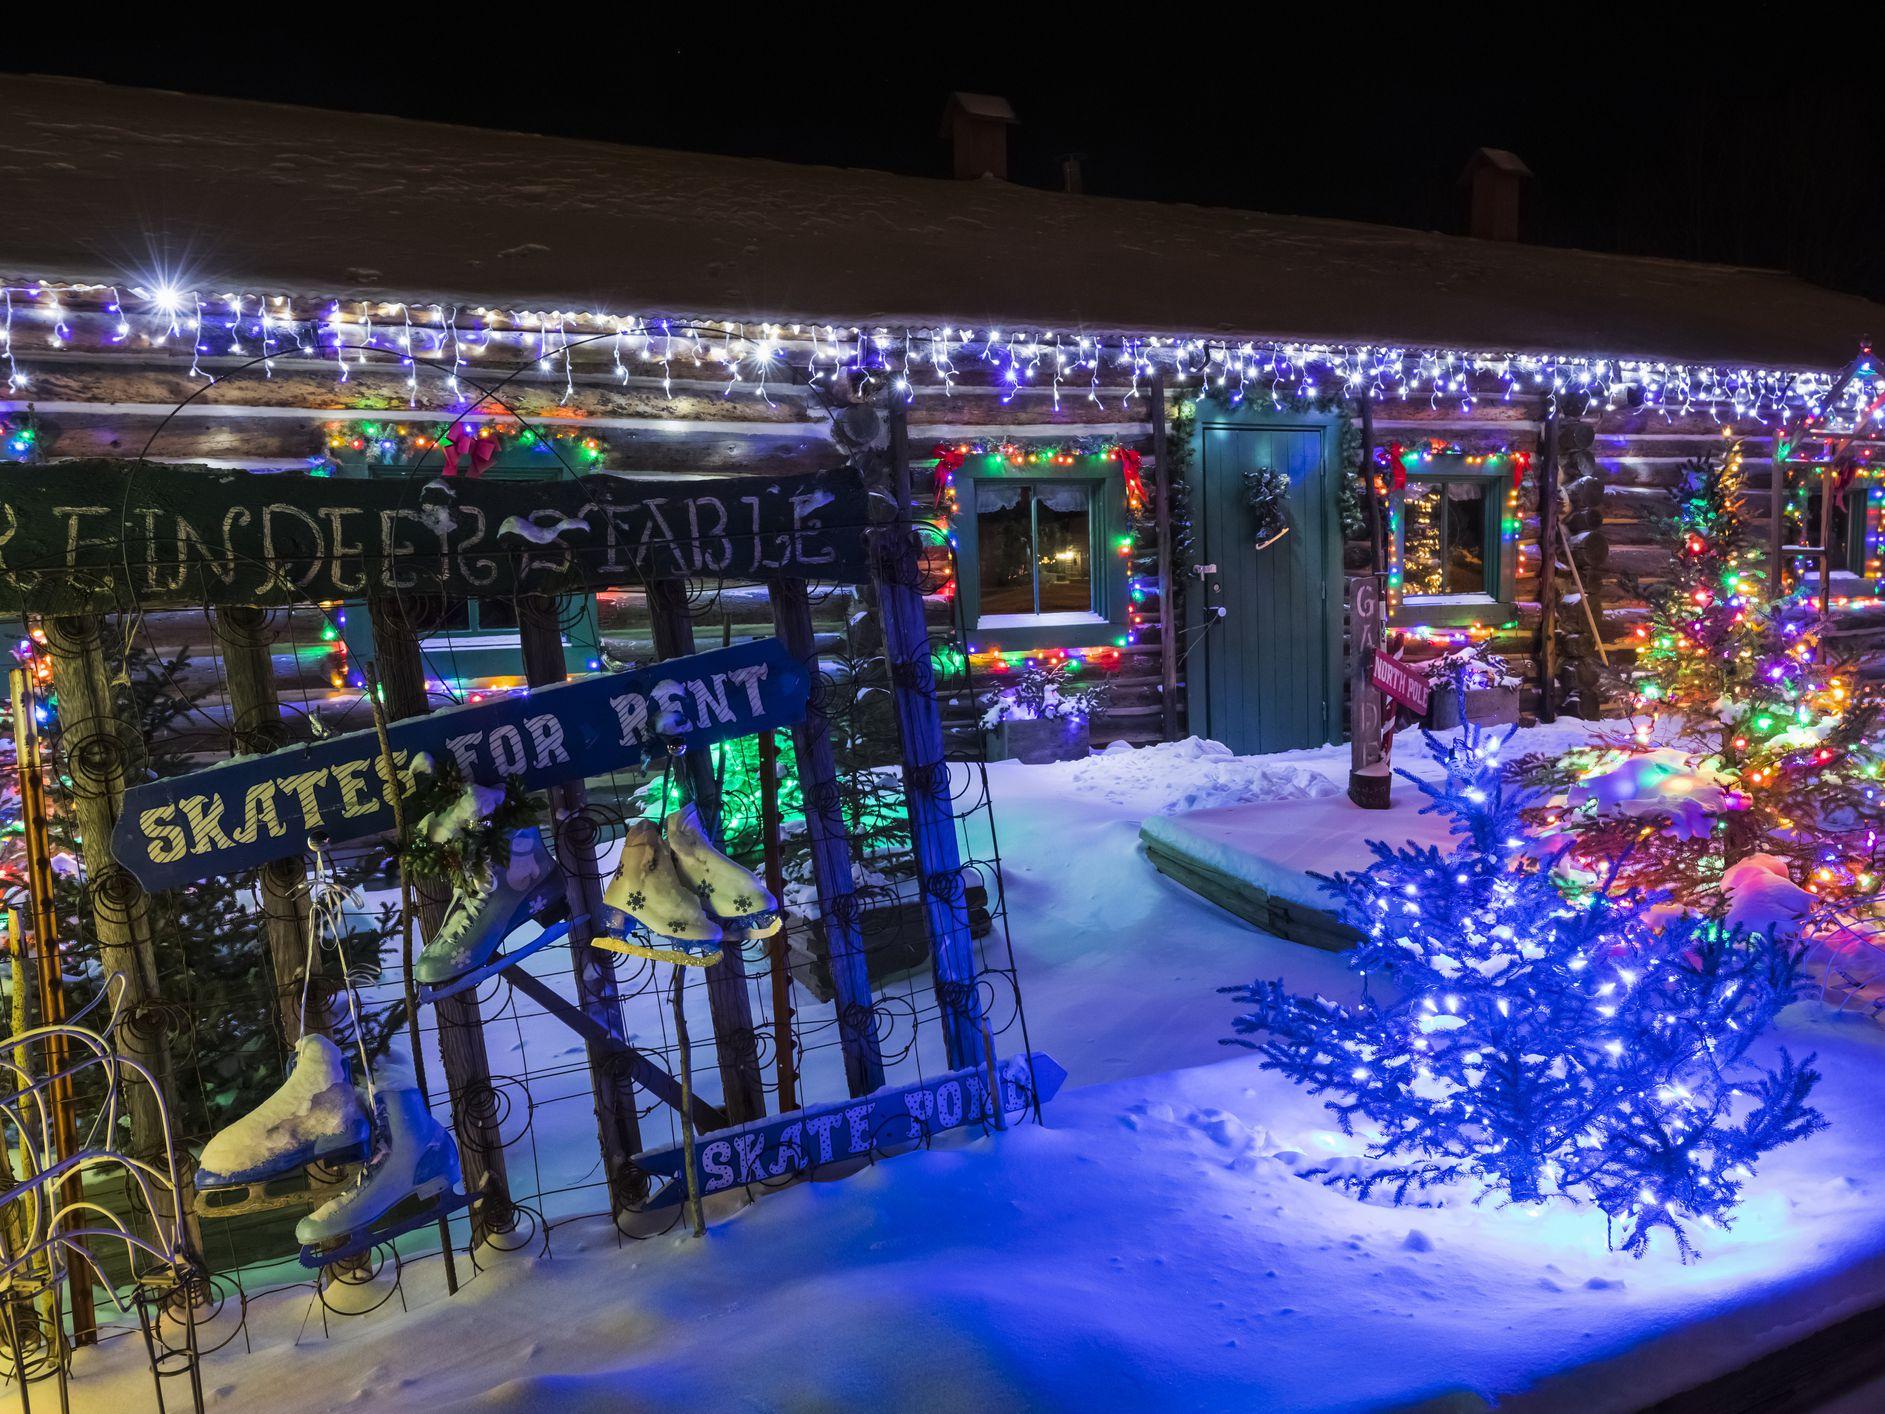 Christmas 2020 Events Fairbanks Ak Top Things to Do in Alaska for Christmas